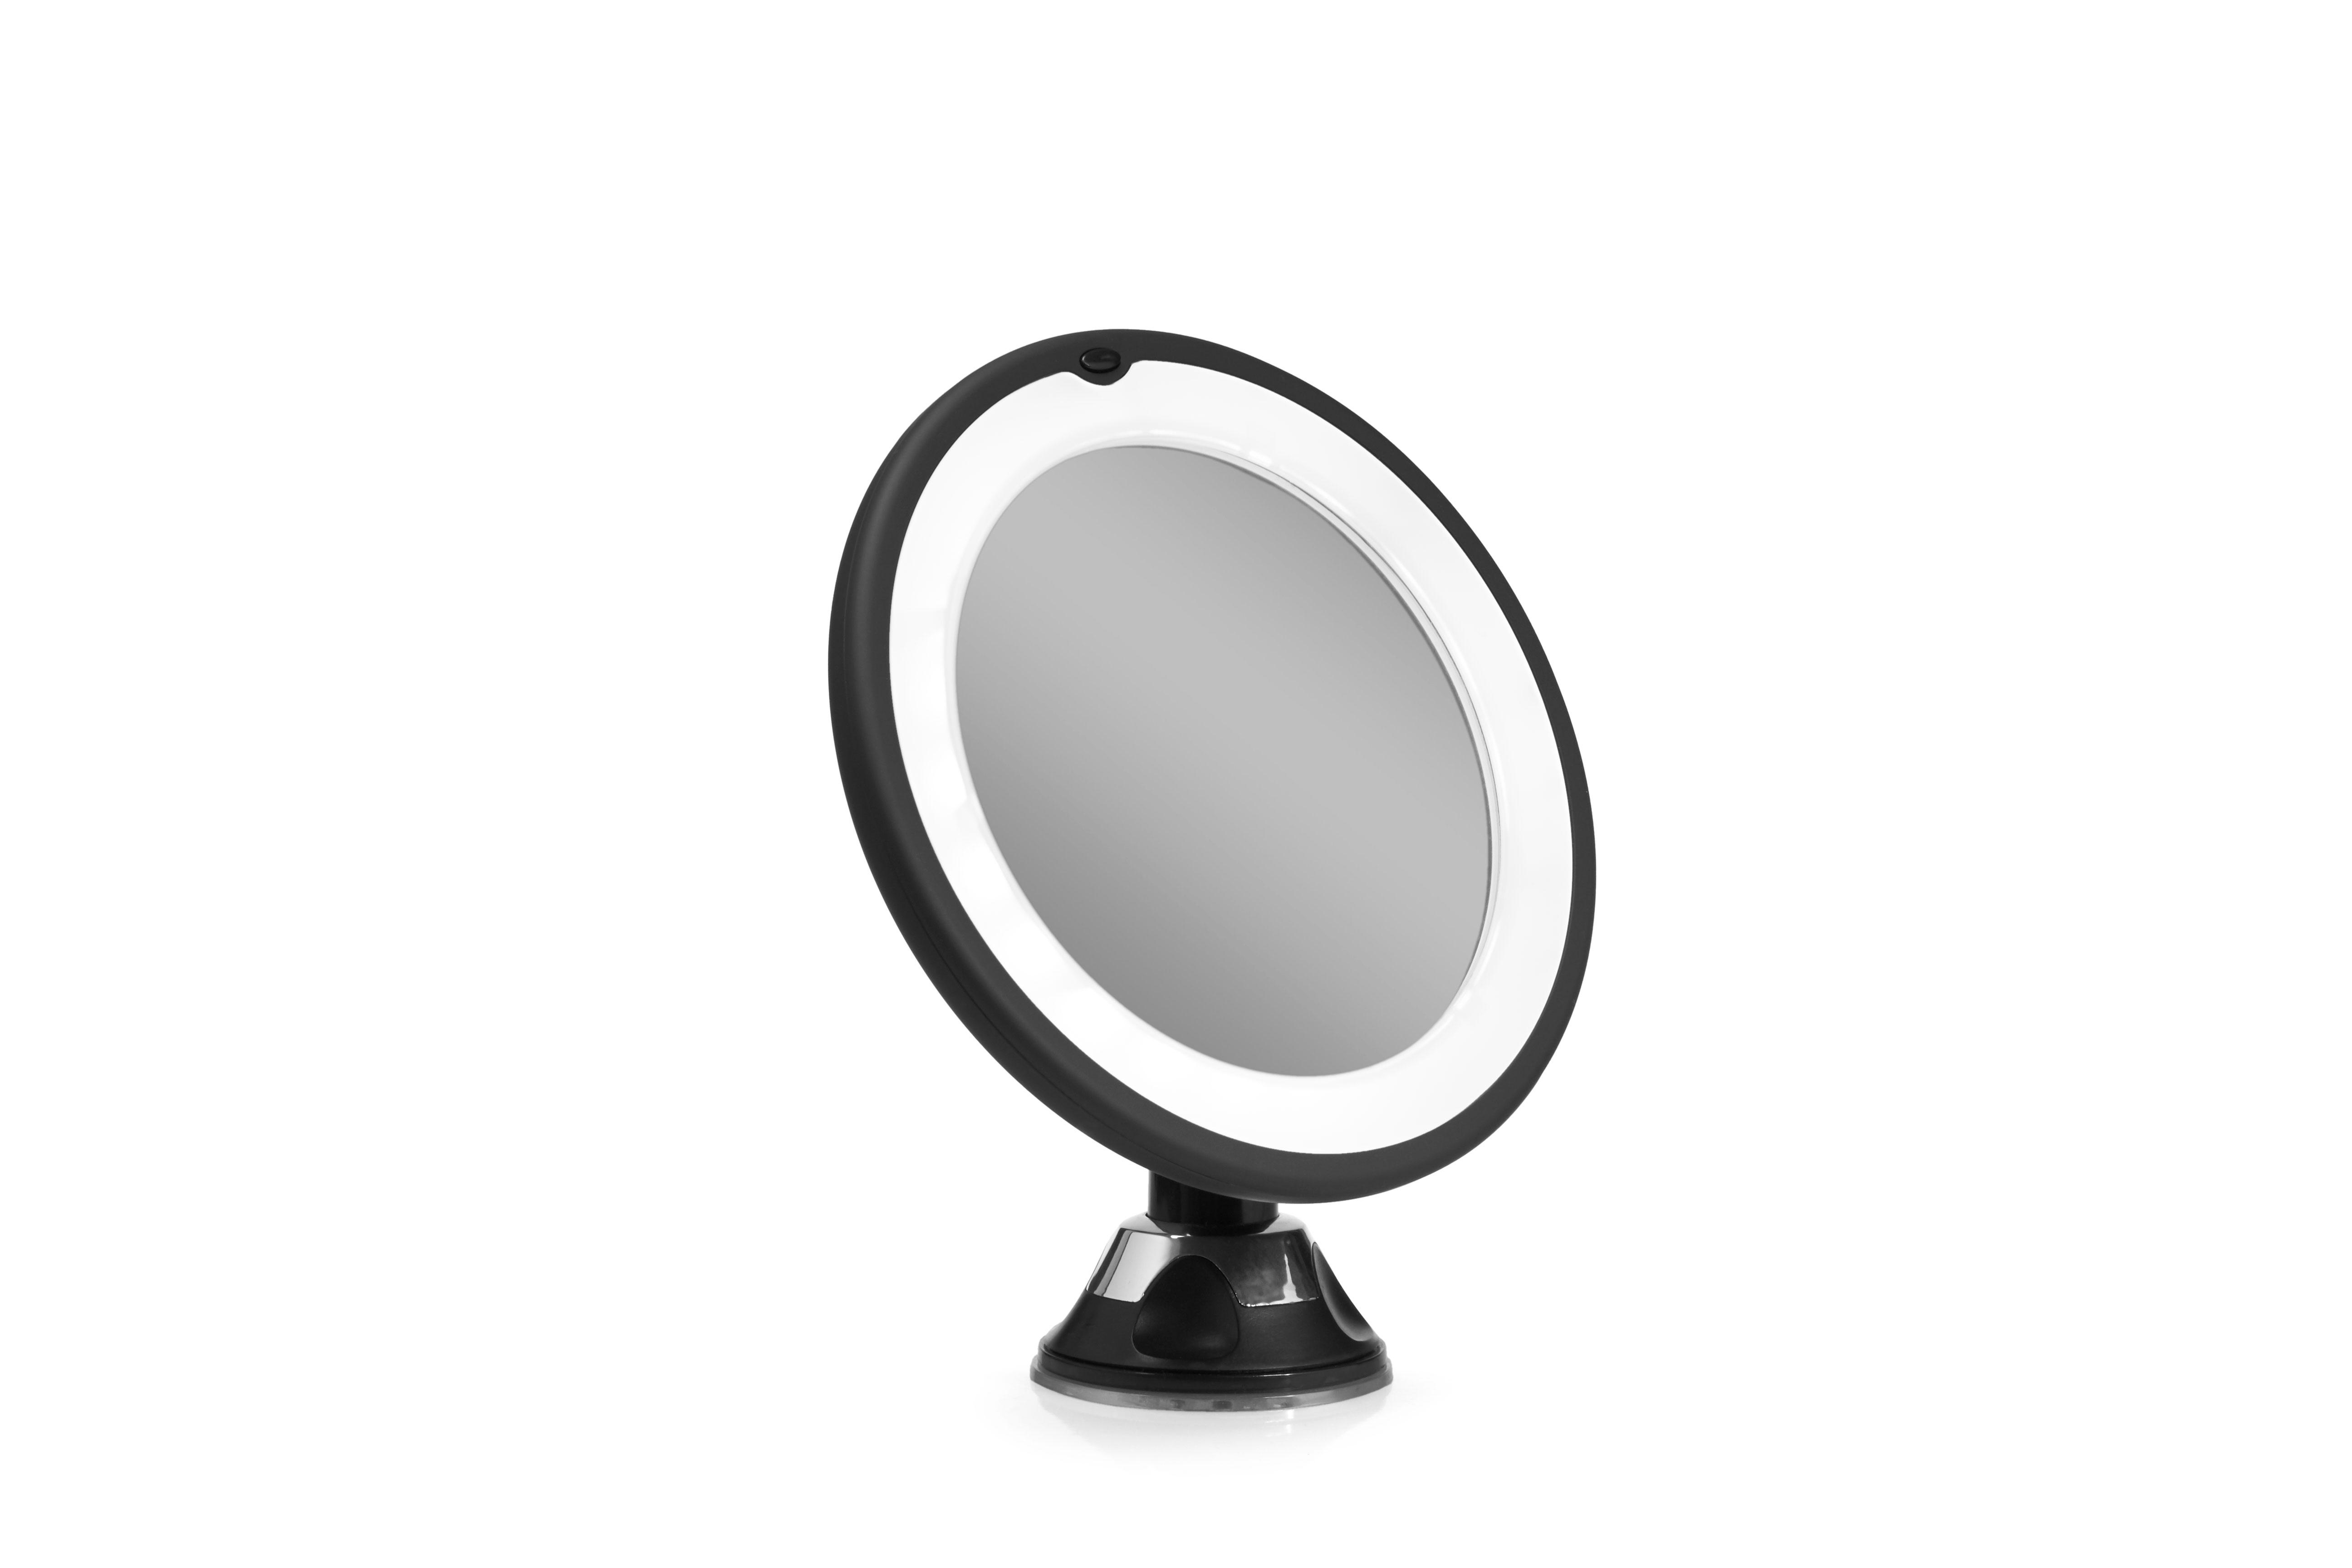 Gillian Jones spejl med lys, x10 forstørrelse